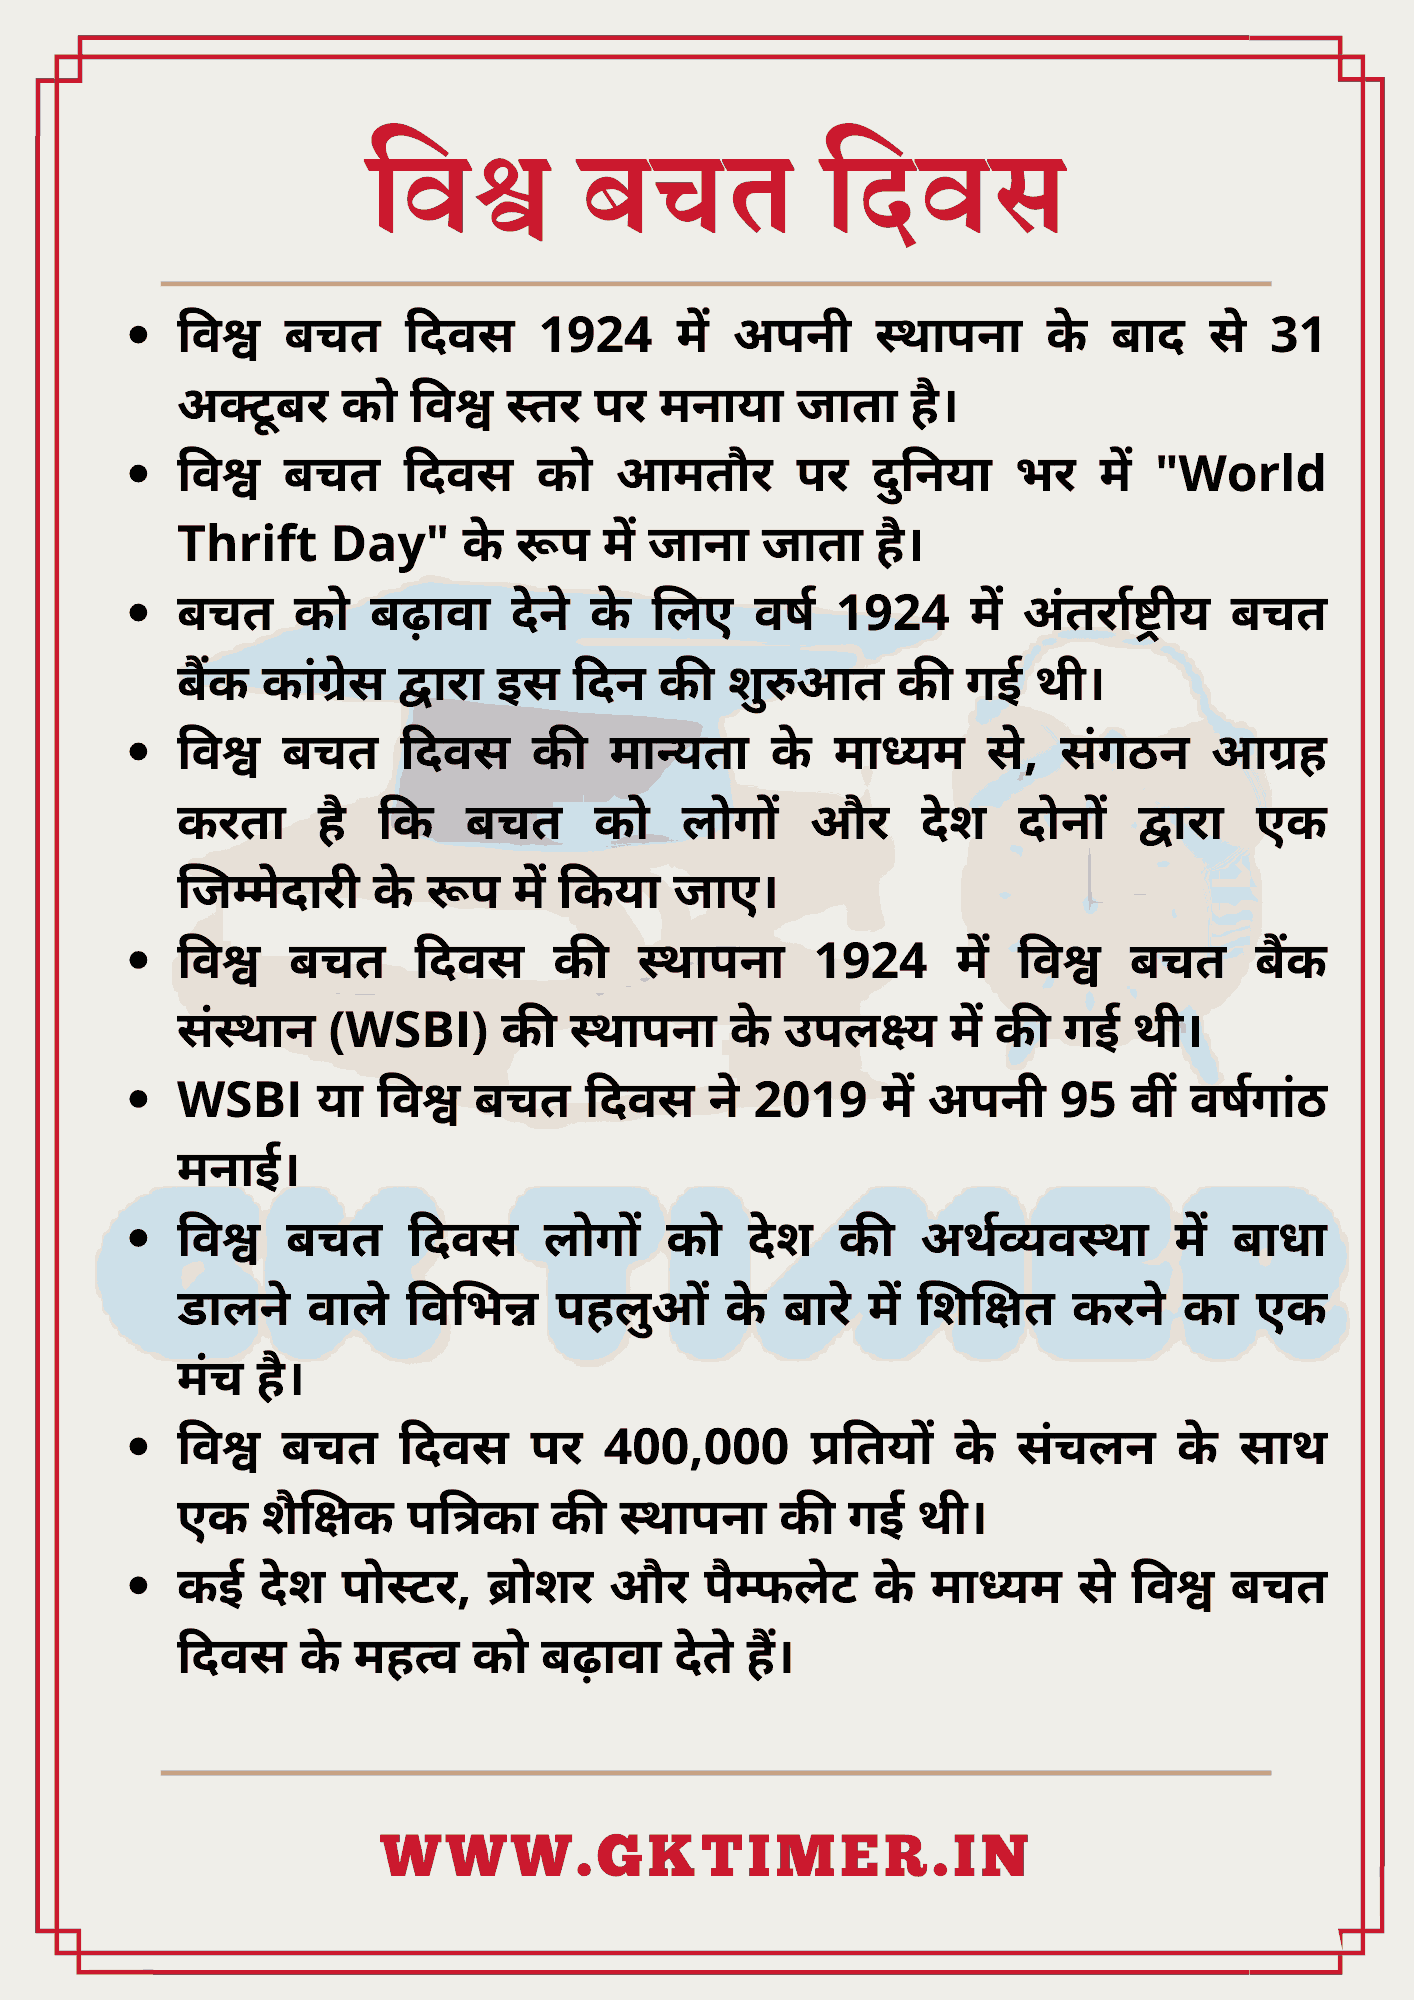 विश्व बचत दिवस पर निबंध   Essay on World Savings Day in Hindi   10 Lines on World Savings Day in Hindi